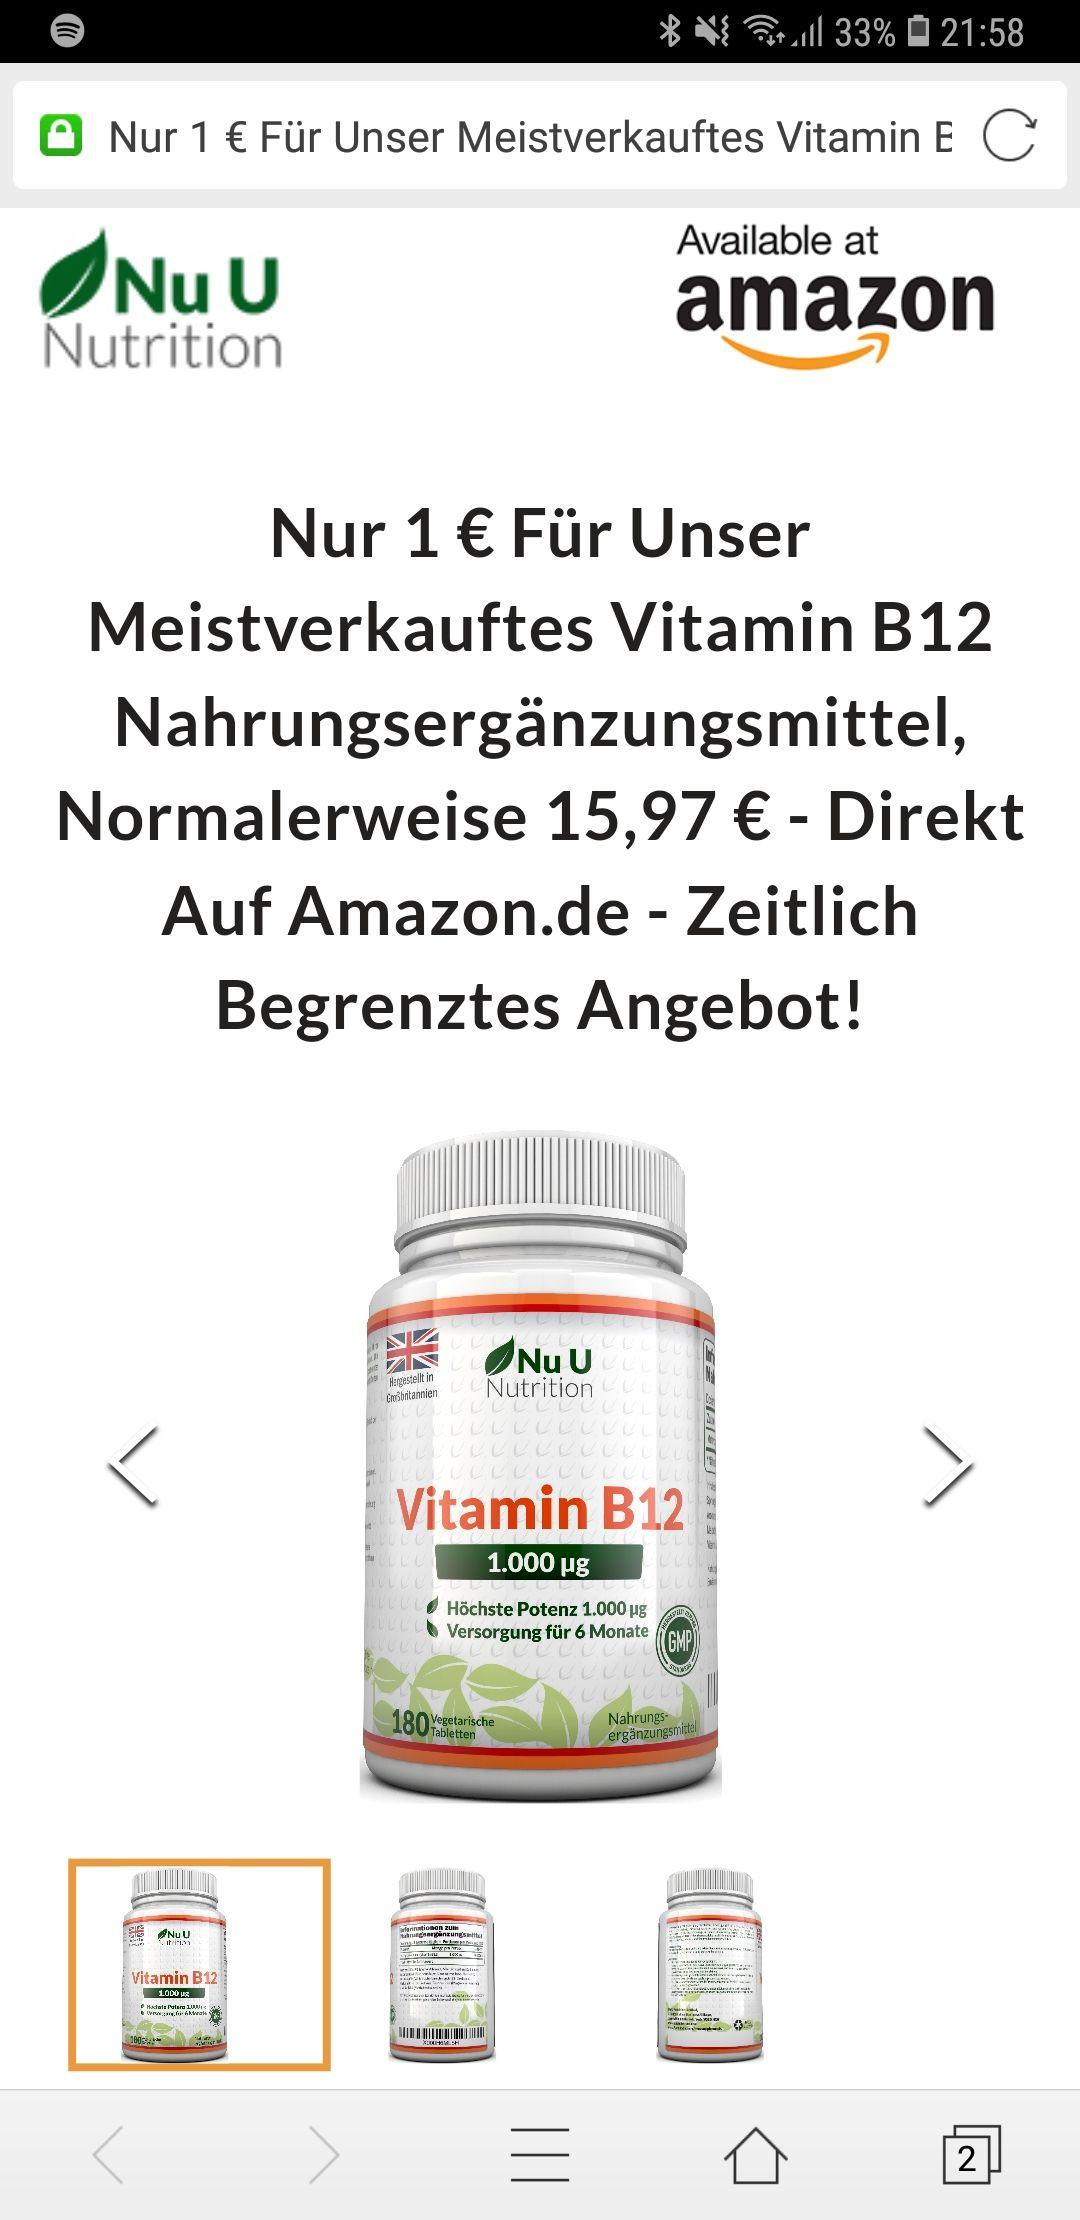 Gratis Vitamin B12 abstauben (Prime ansonsten +Vsk)